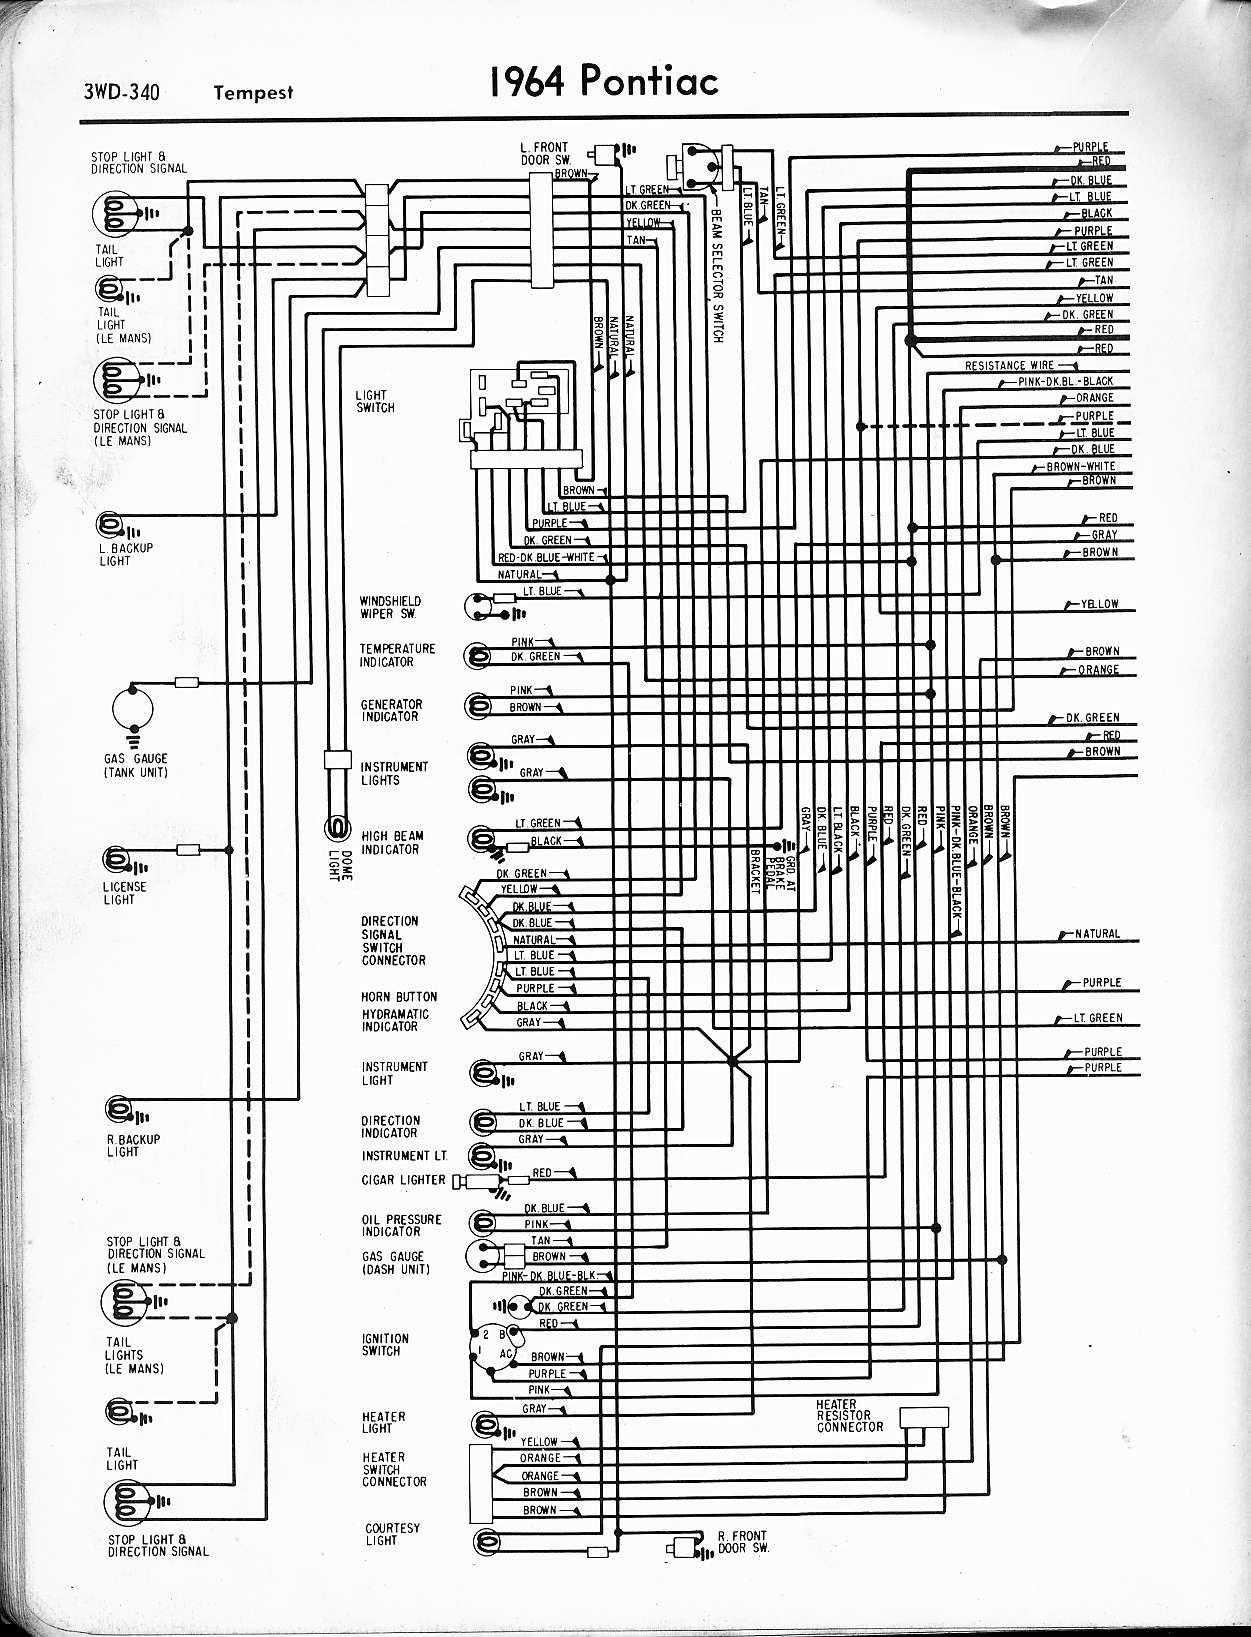 1965 Gto Wiring Diagram - wiring diagram E7 1969 pontiac gto wiring diagram capoeiracre.de